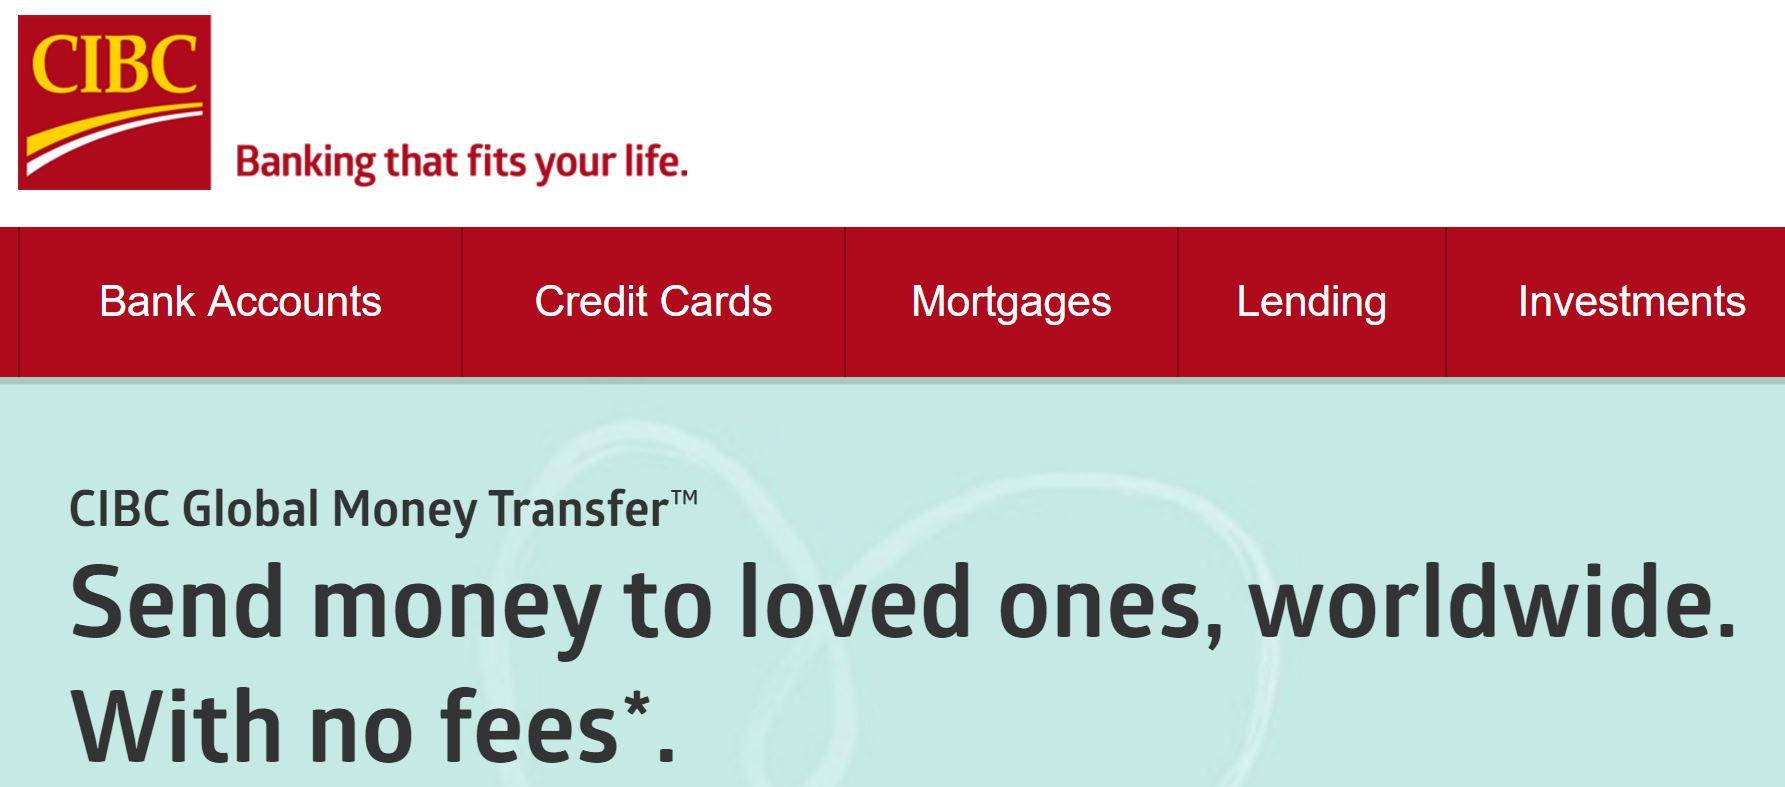 Money Transfer: 5 Hacks to Nudge Consumers